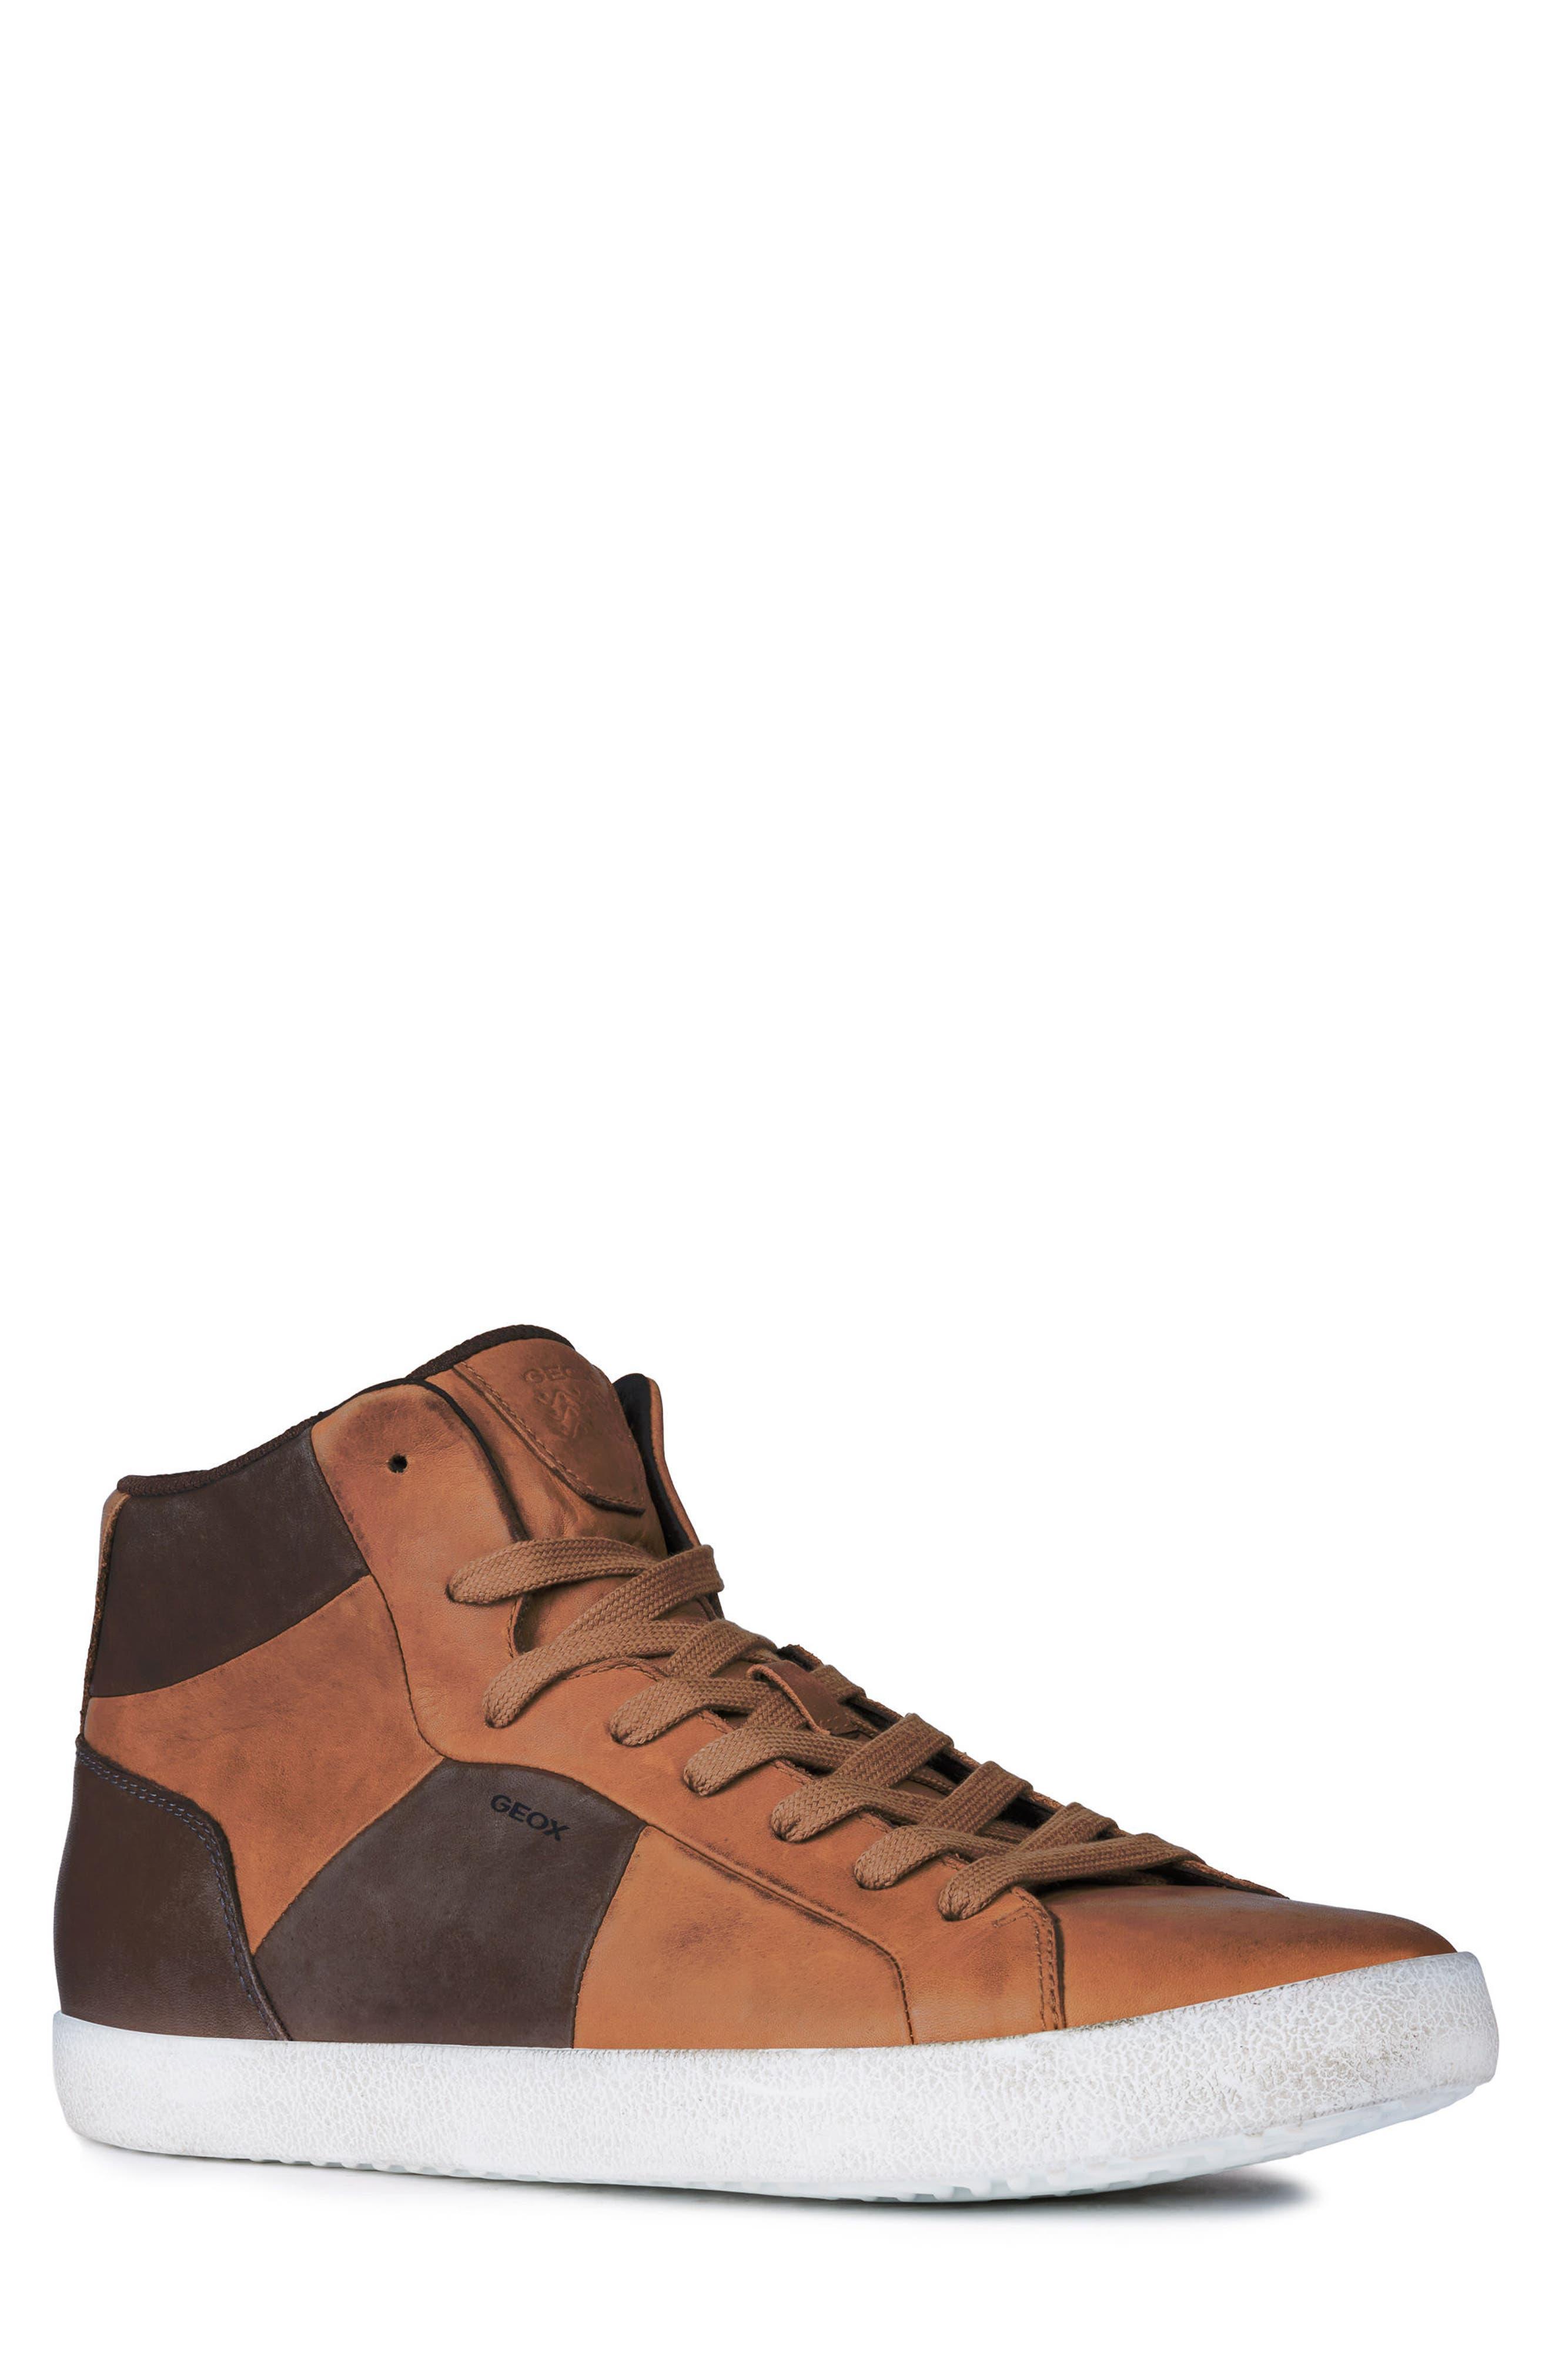 Smart 84 High Top Sneaker,                         Main,                         color, COGNAC/ COFFEE LEATHER